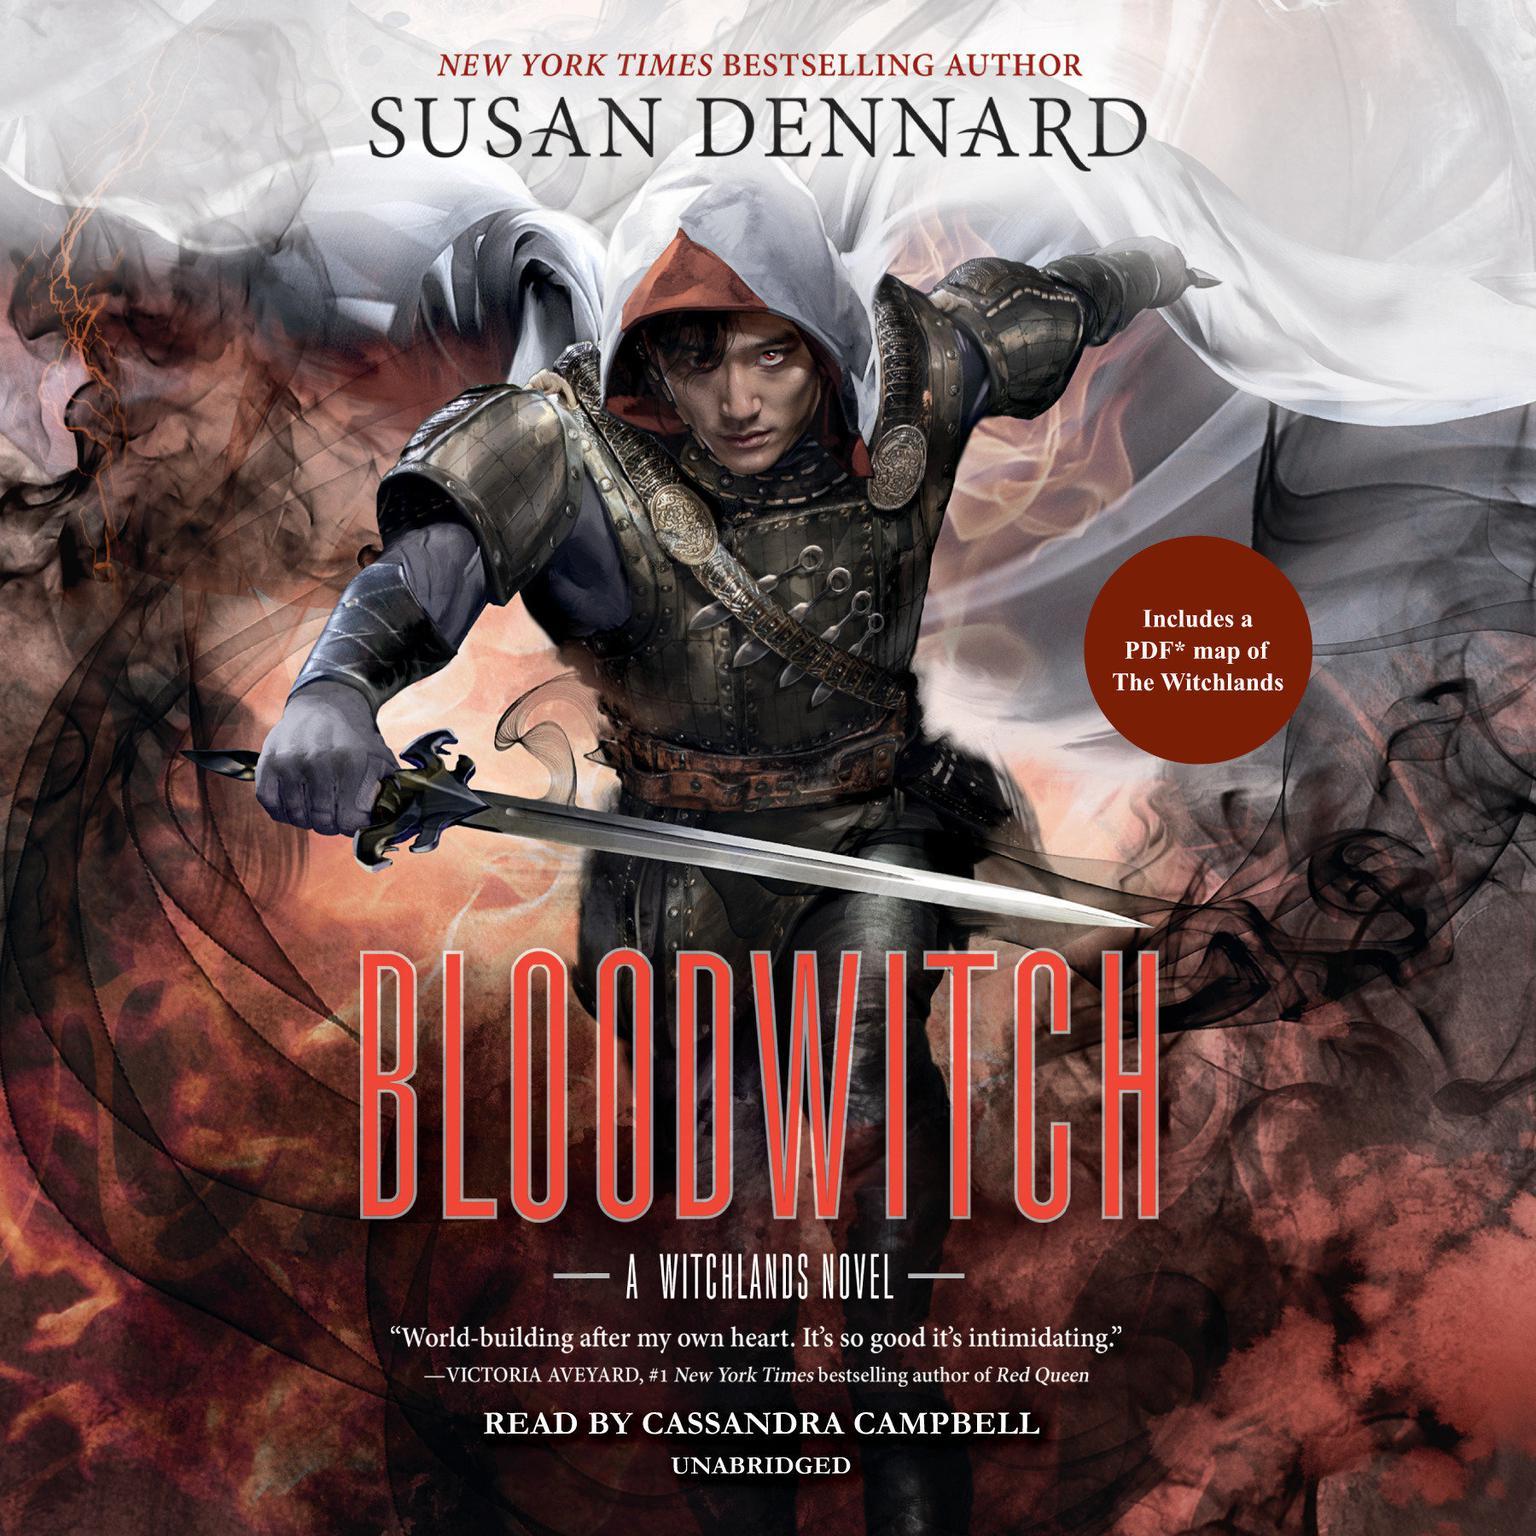 Bloodwitch: Witchlands Novel Audiobook, by Susan Dennard